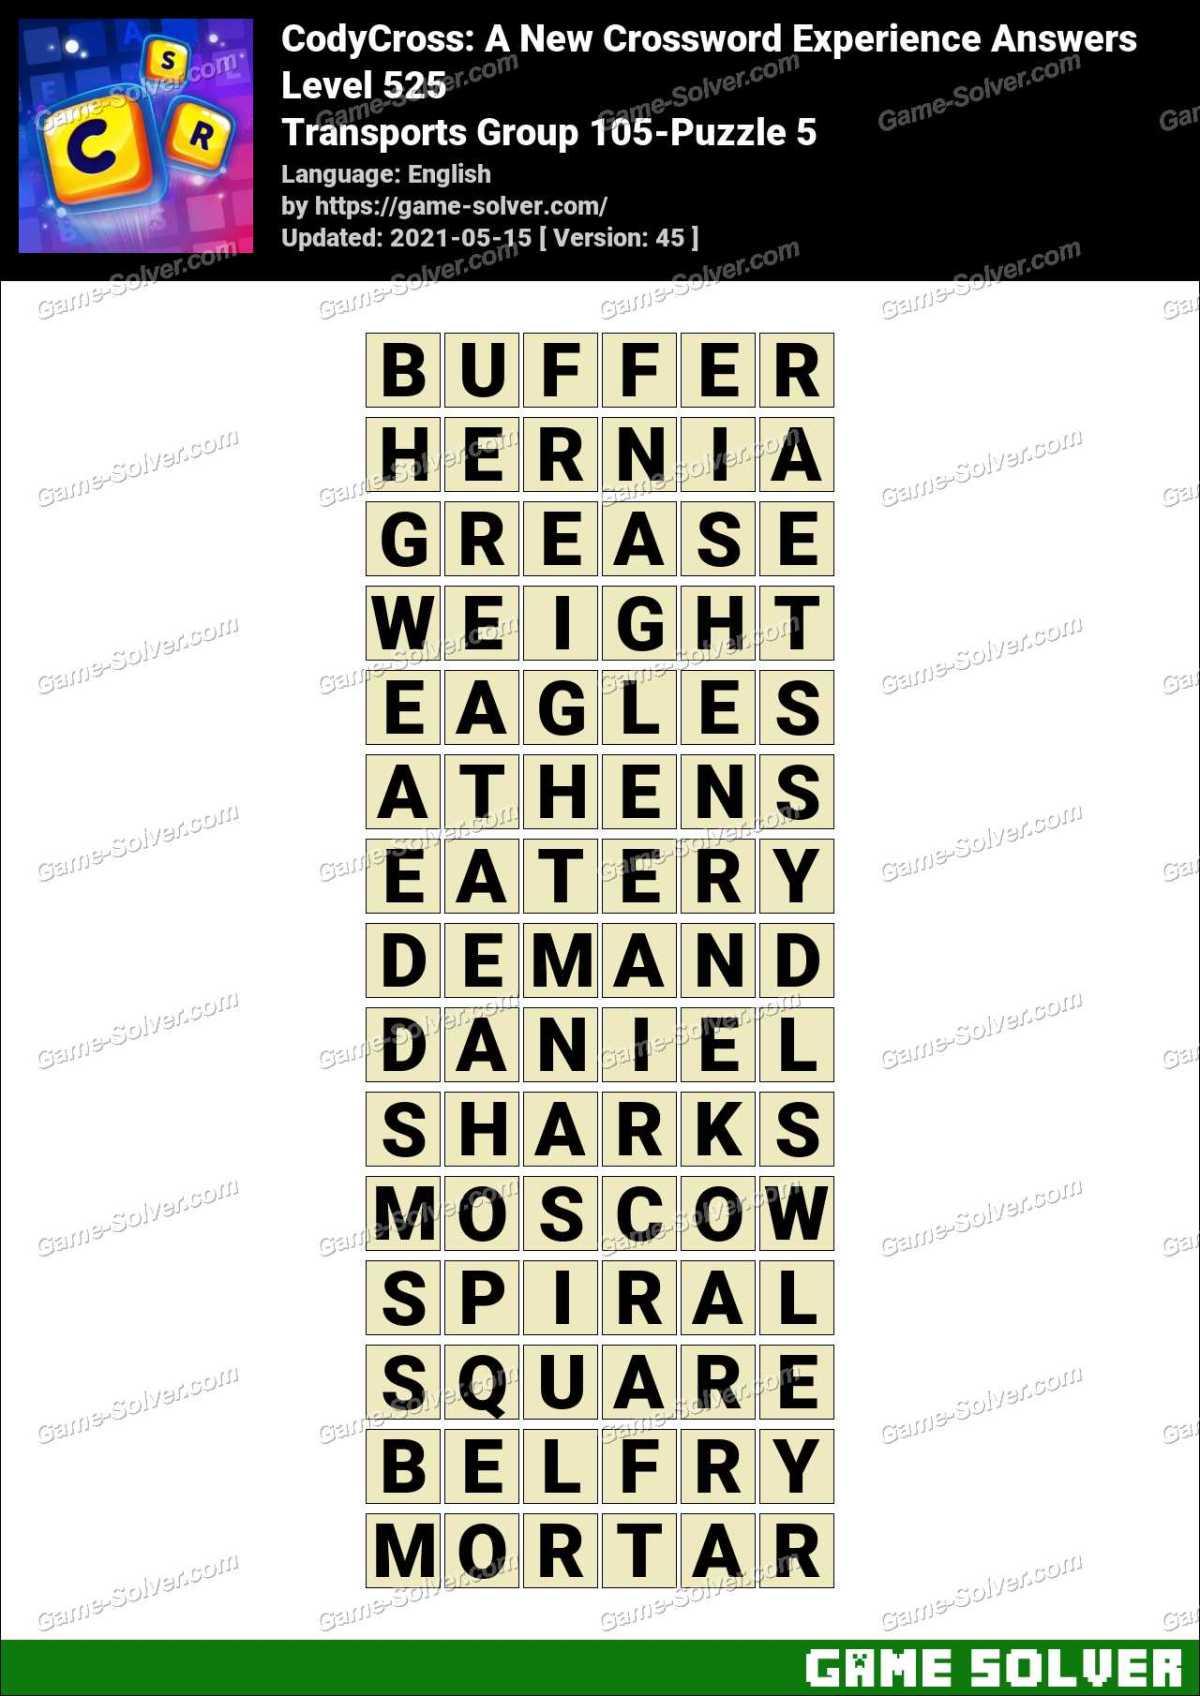 Mortar Master Crossword Clue